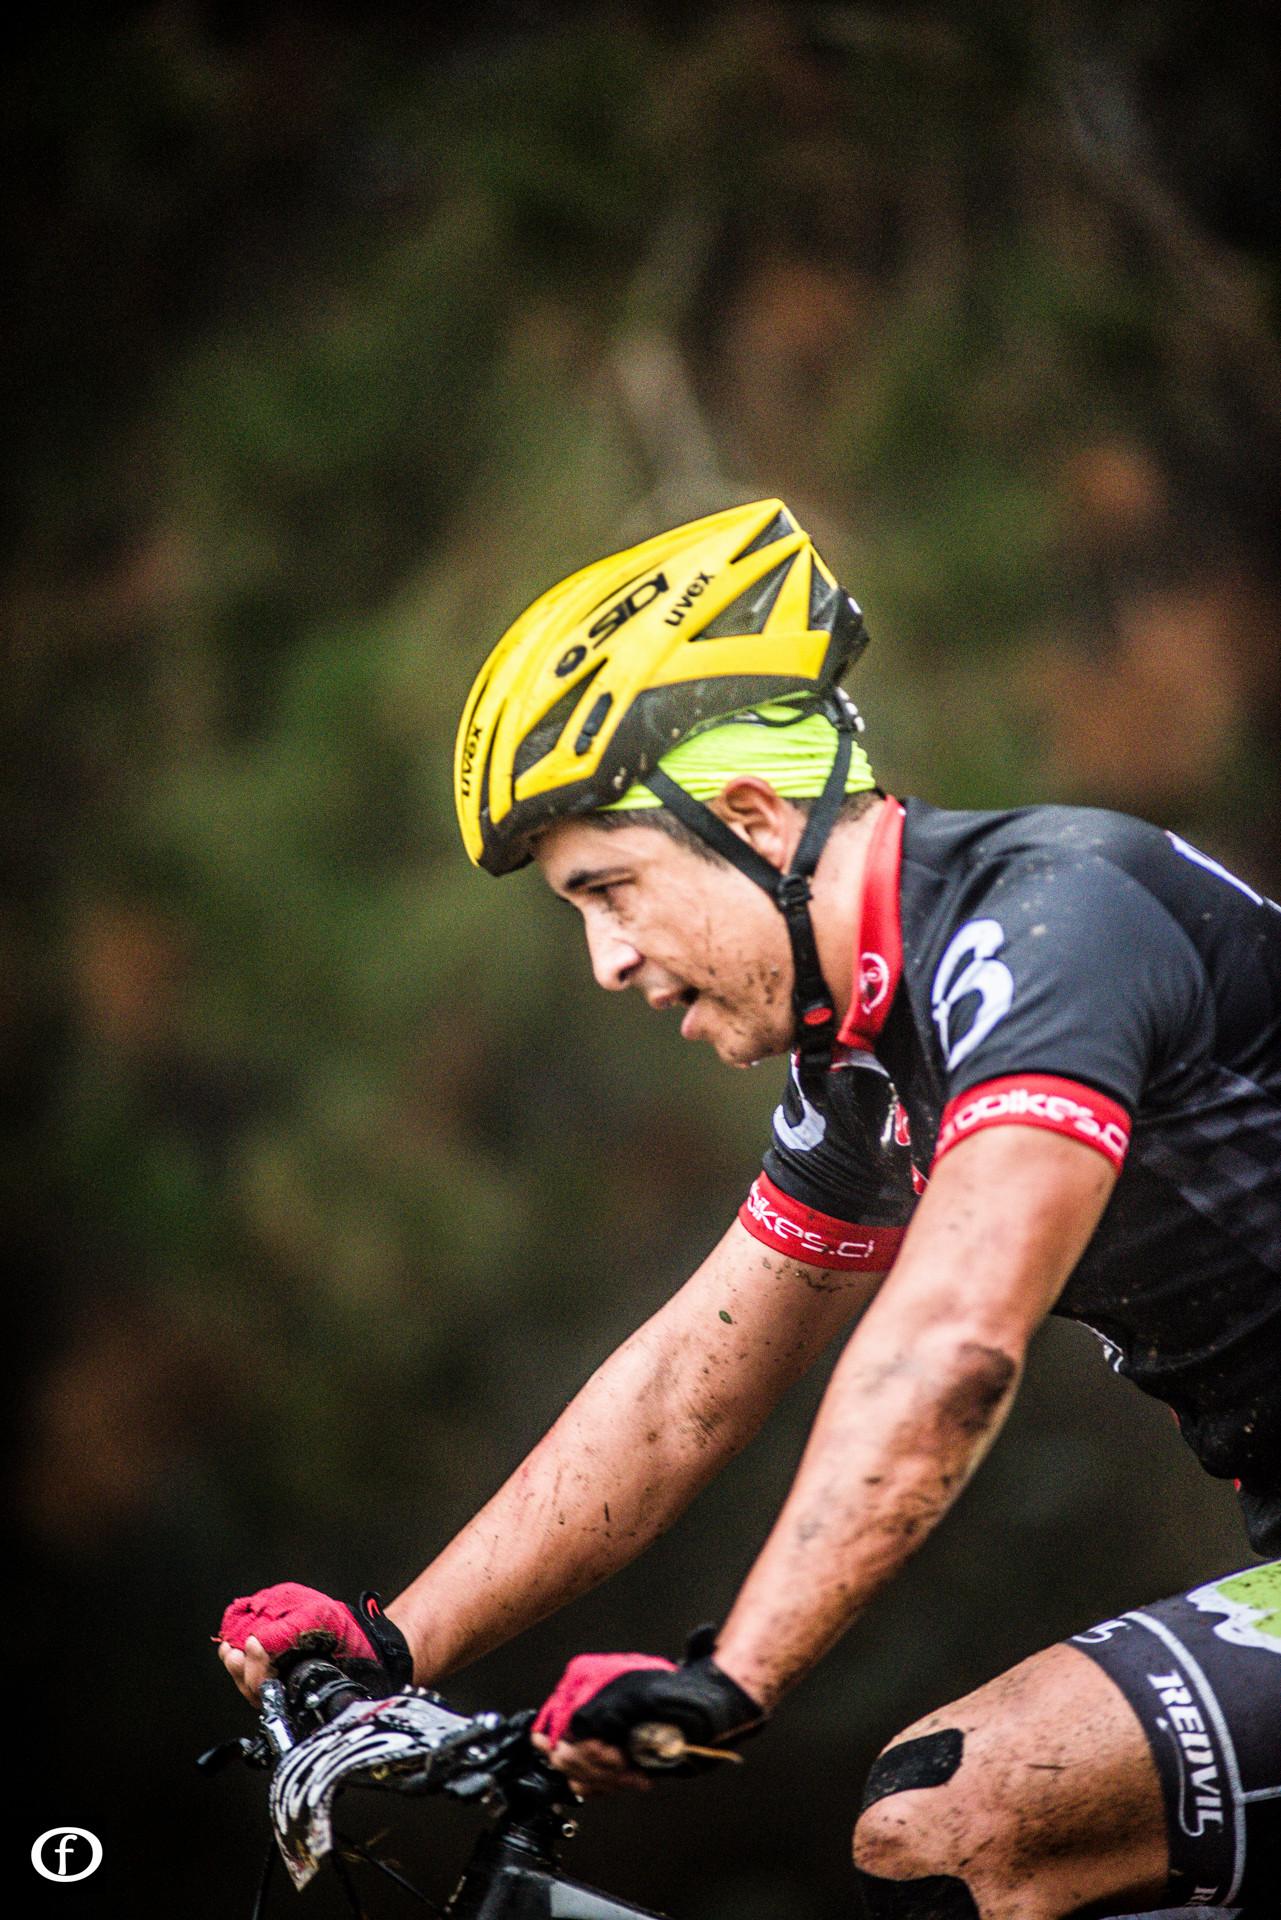 2015-05-17-Ciclismo Enduro-28.jpg